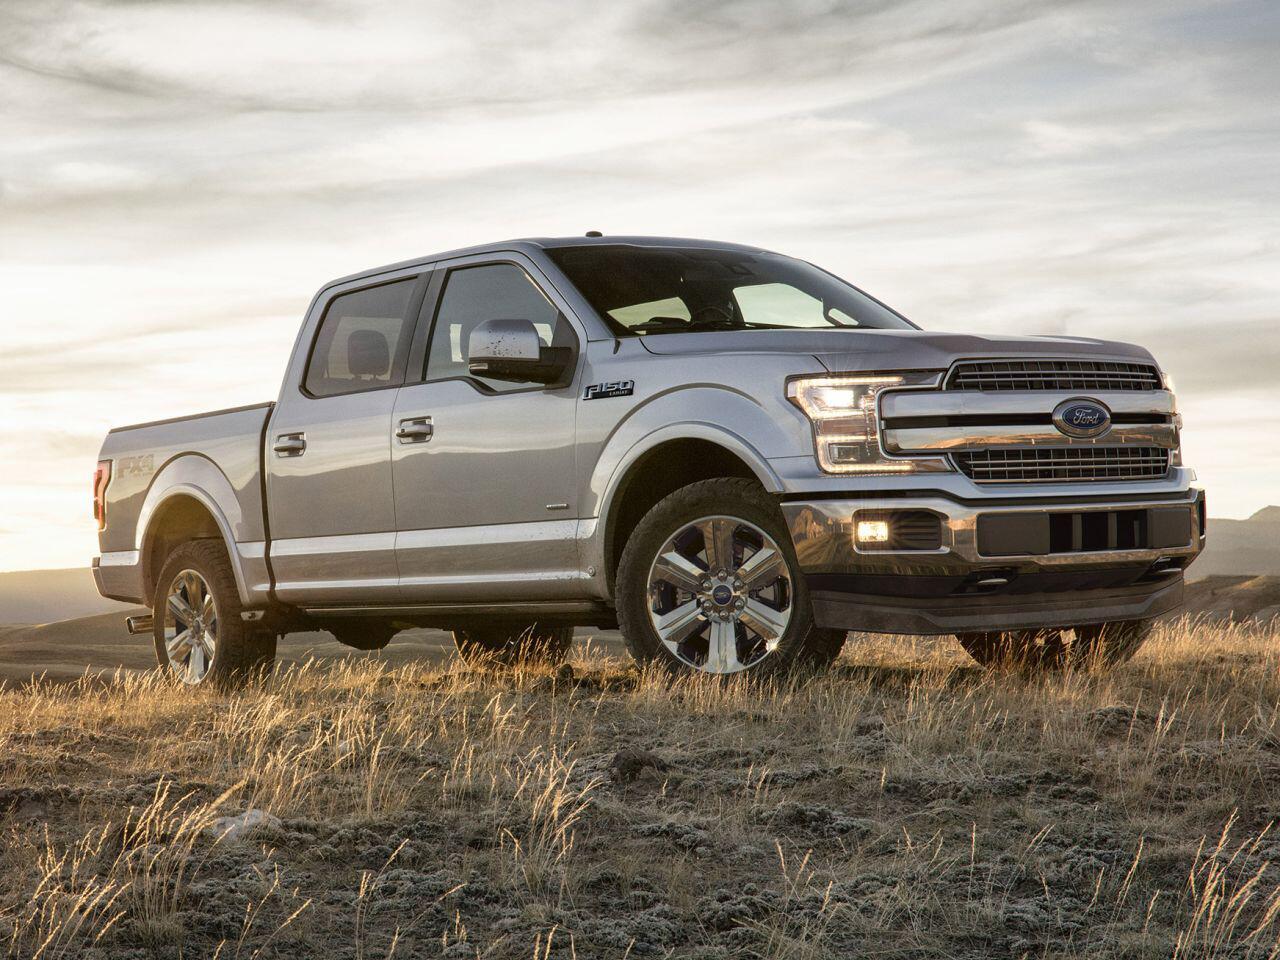 Bild zu Platz 6: Ford F-Series